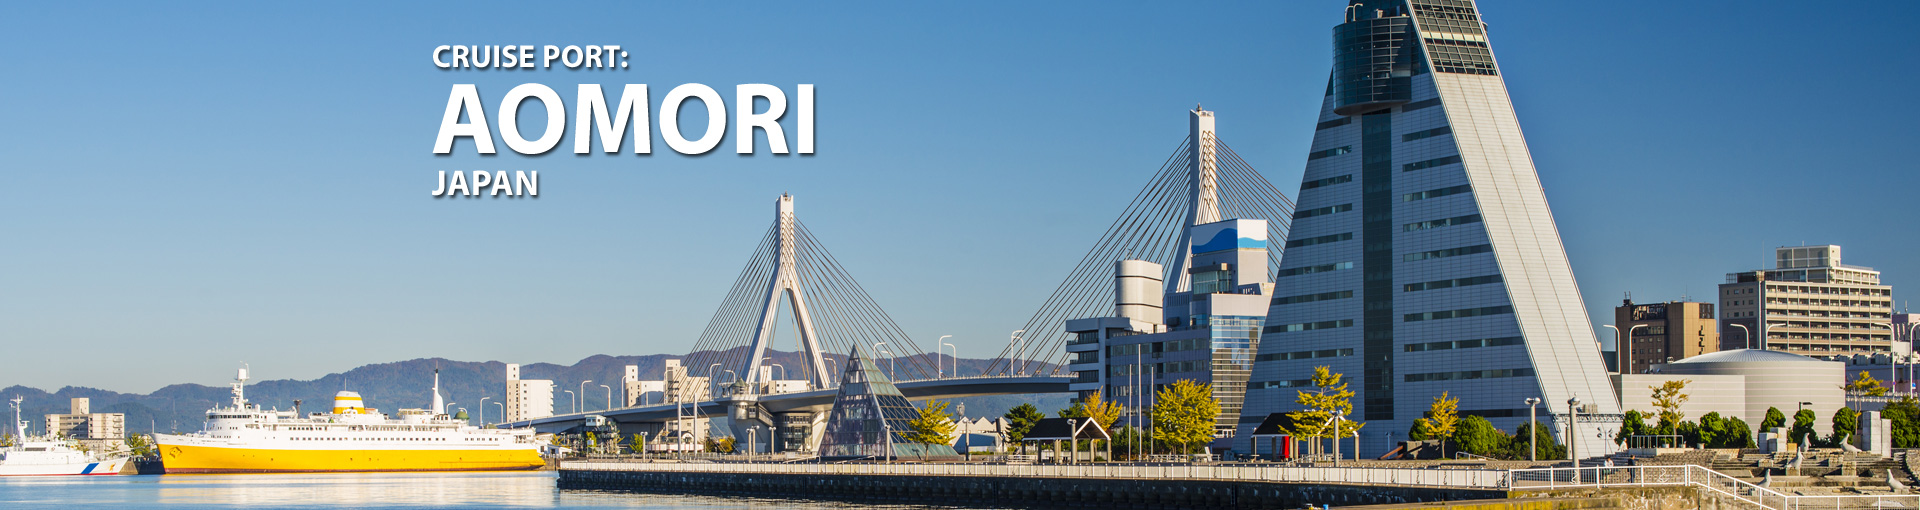 Cruises to Aomori, Japan